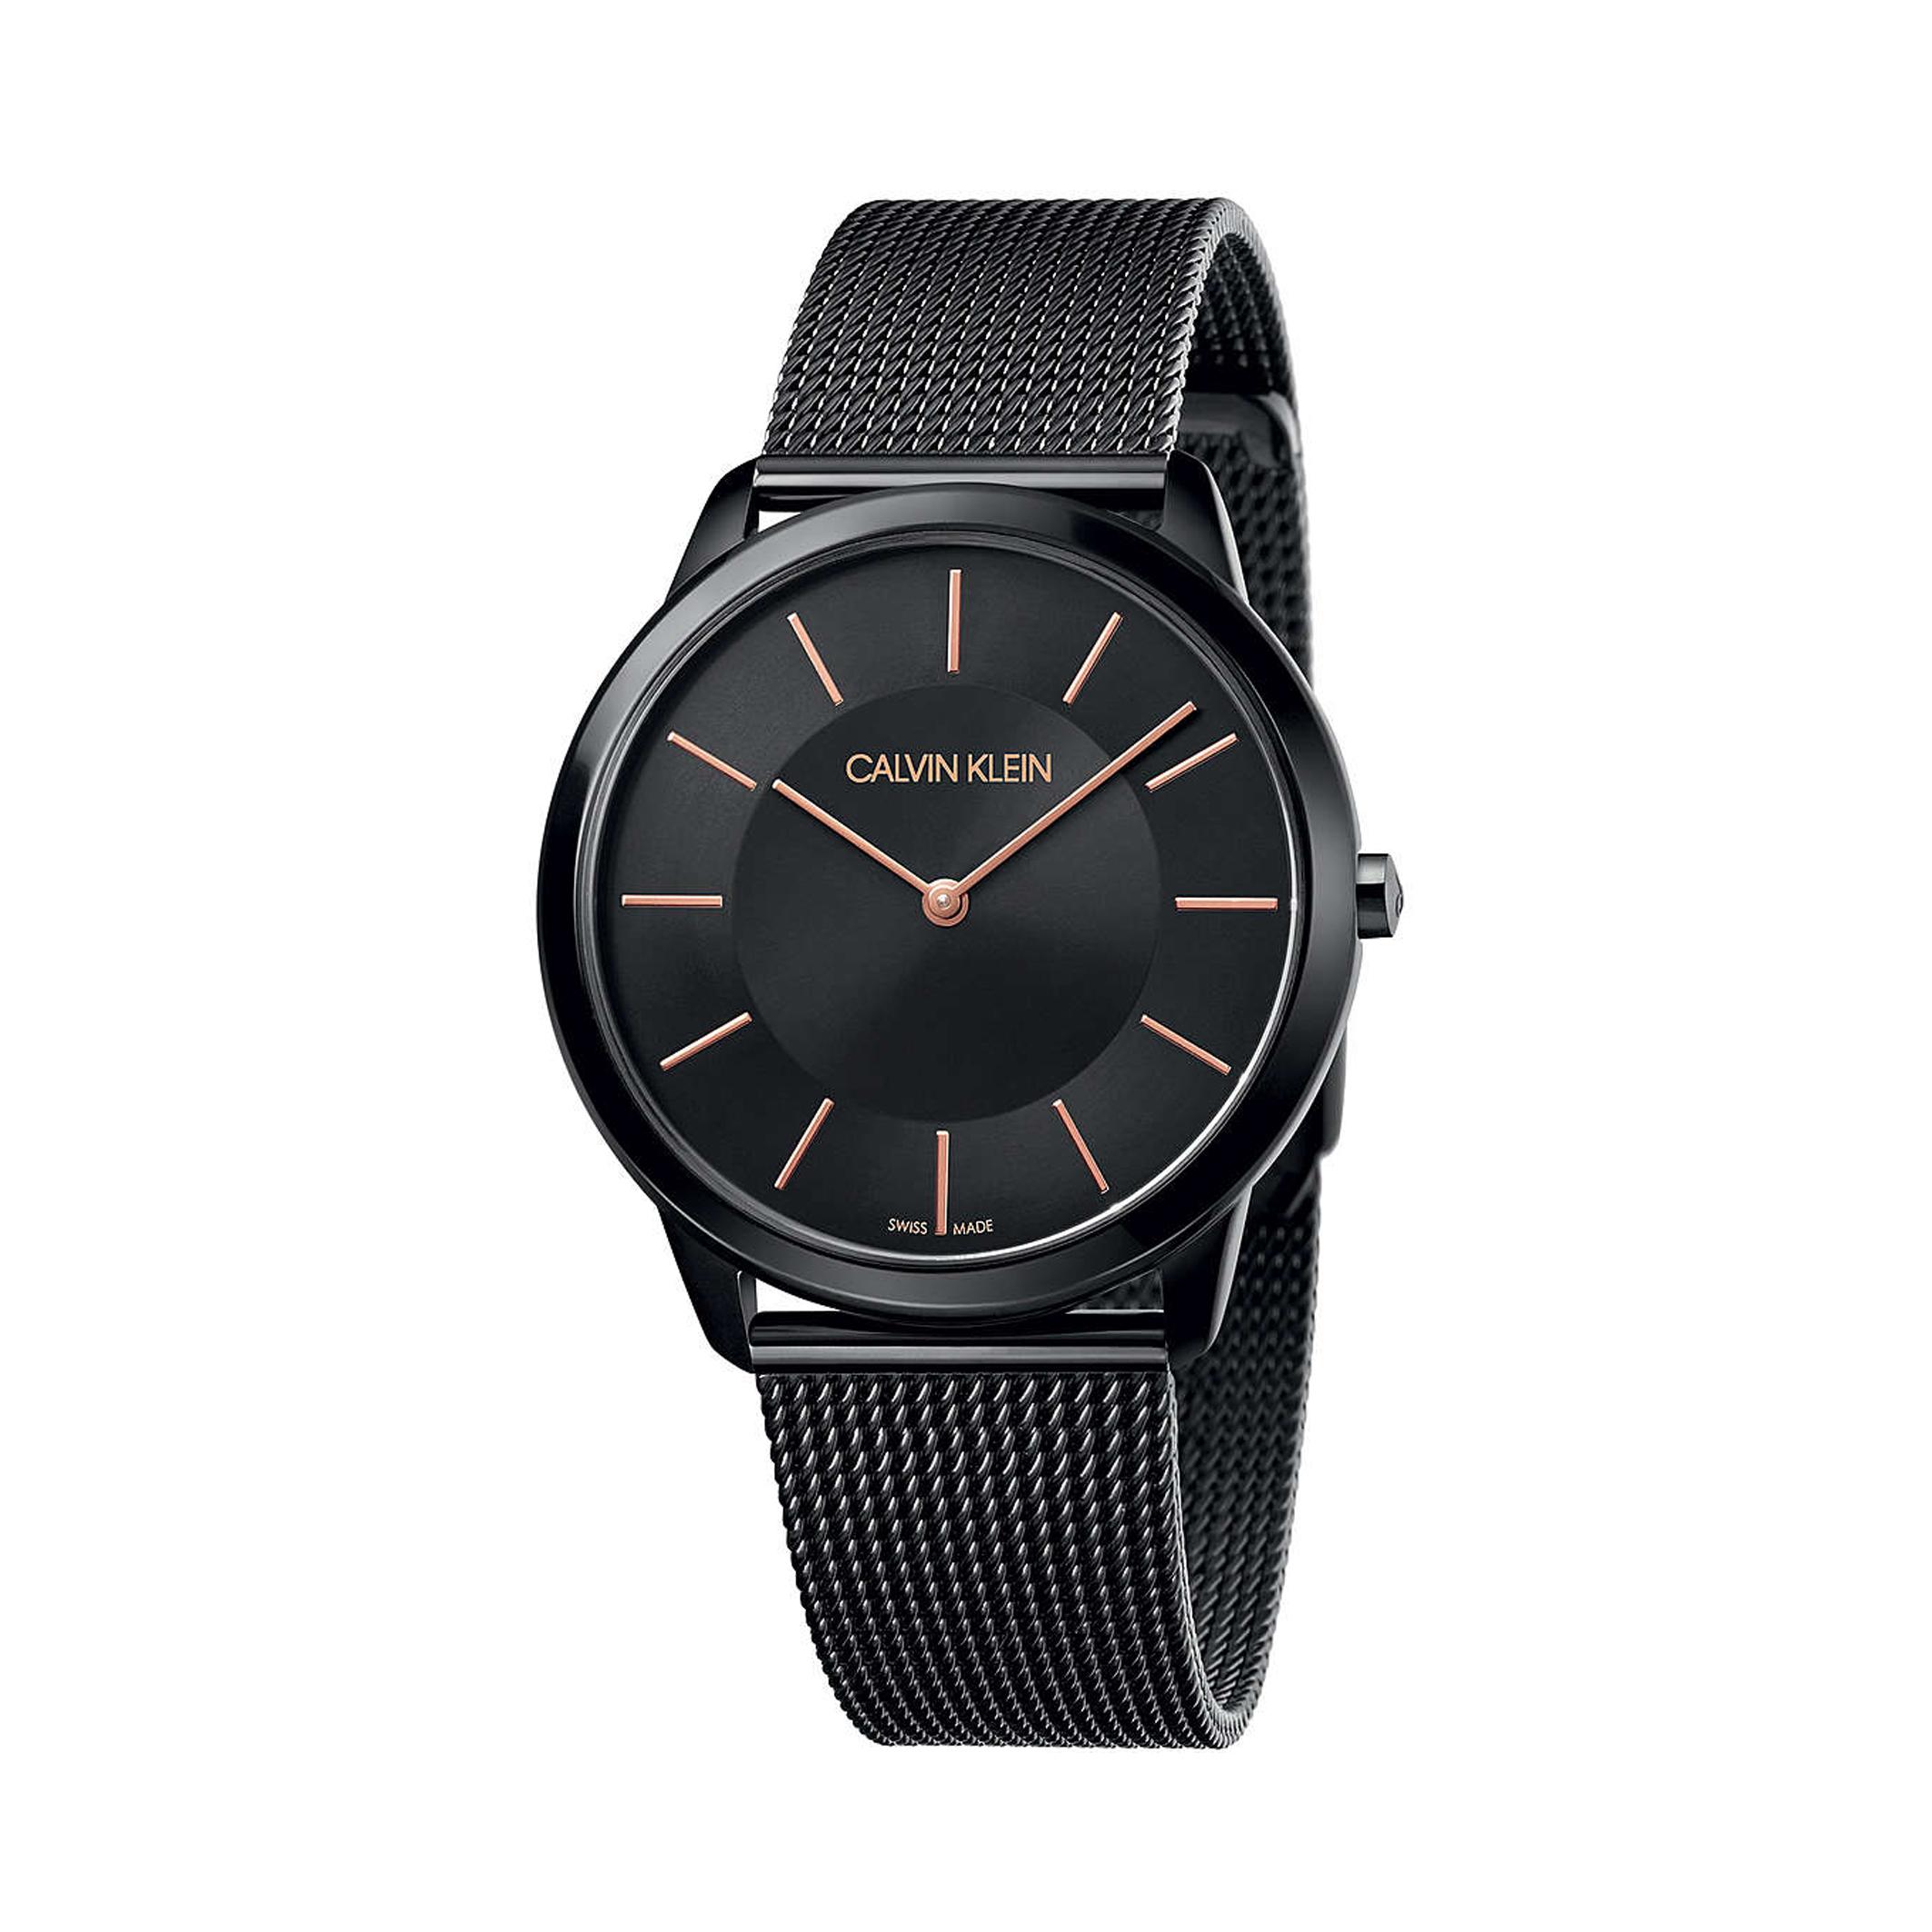 Calvin Klein - MINIMAL_K3M214 - Black